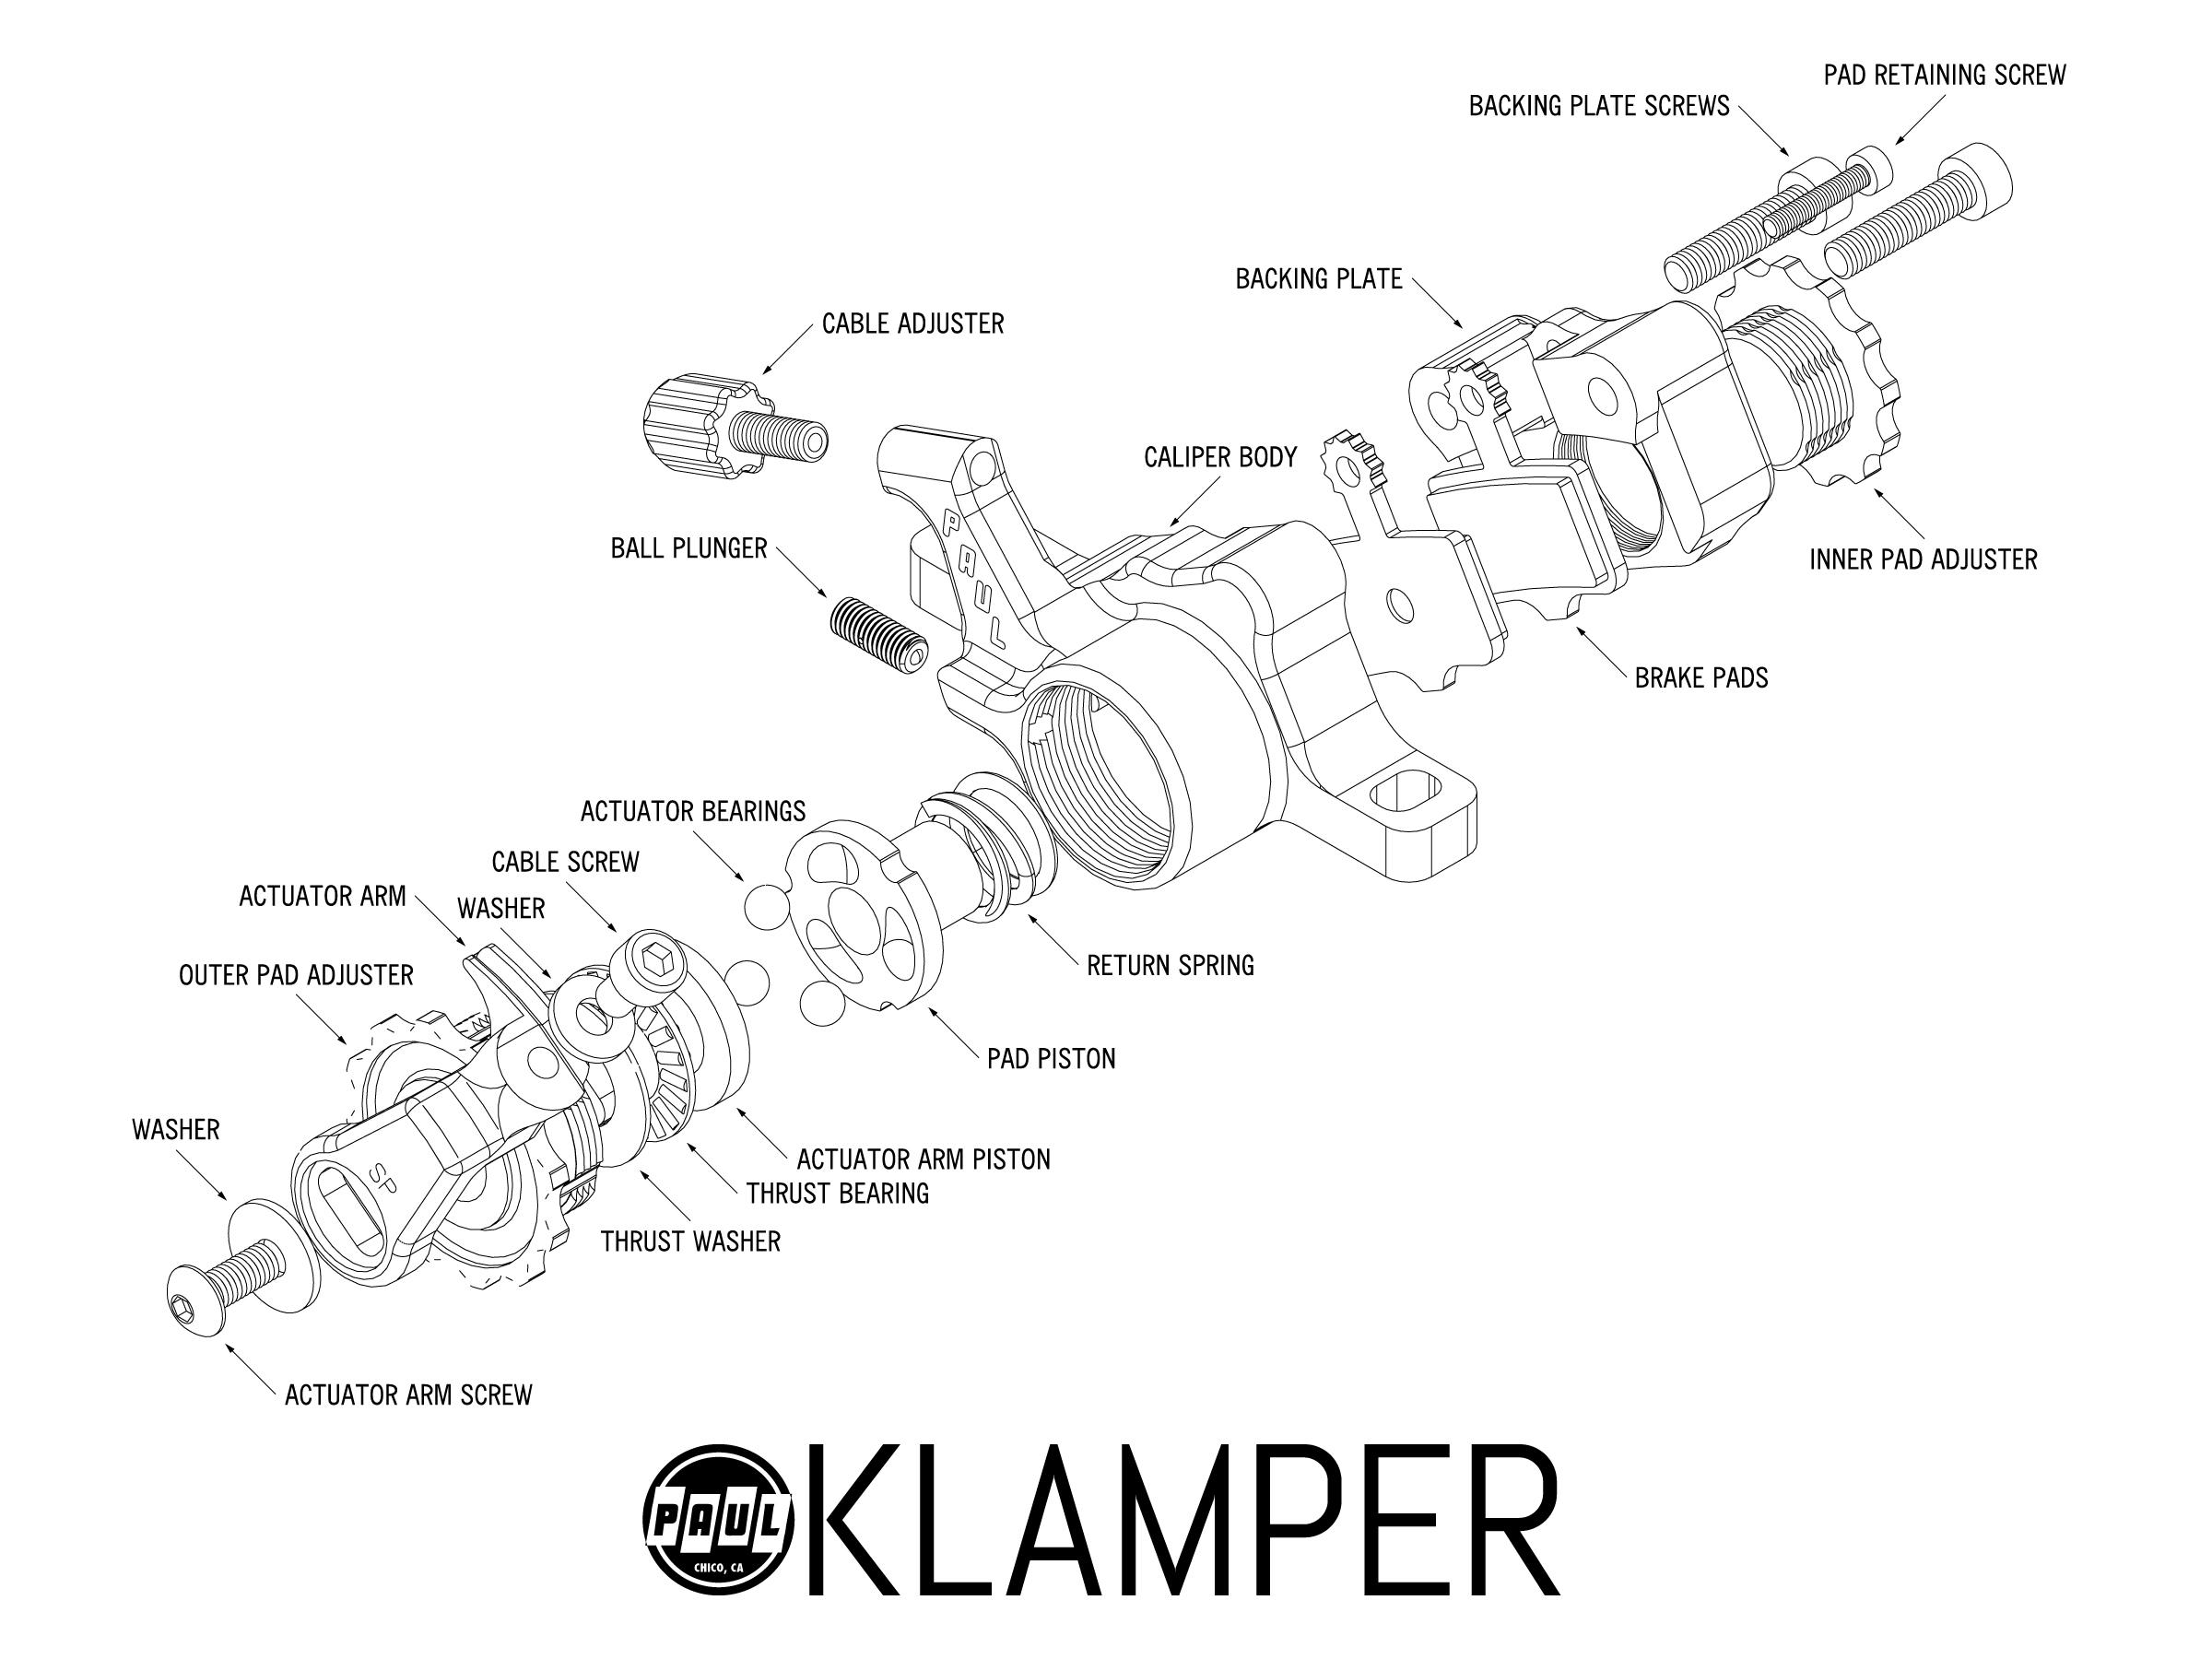 I S Klamper Paul Component Engineering